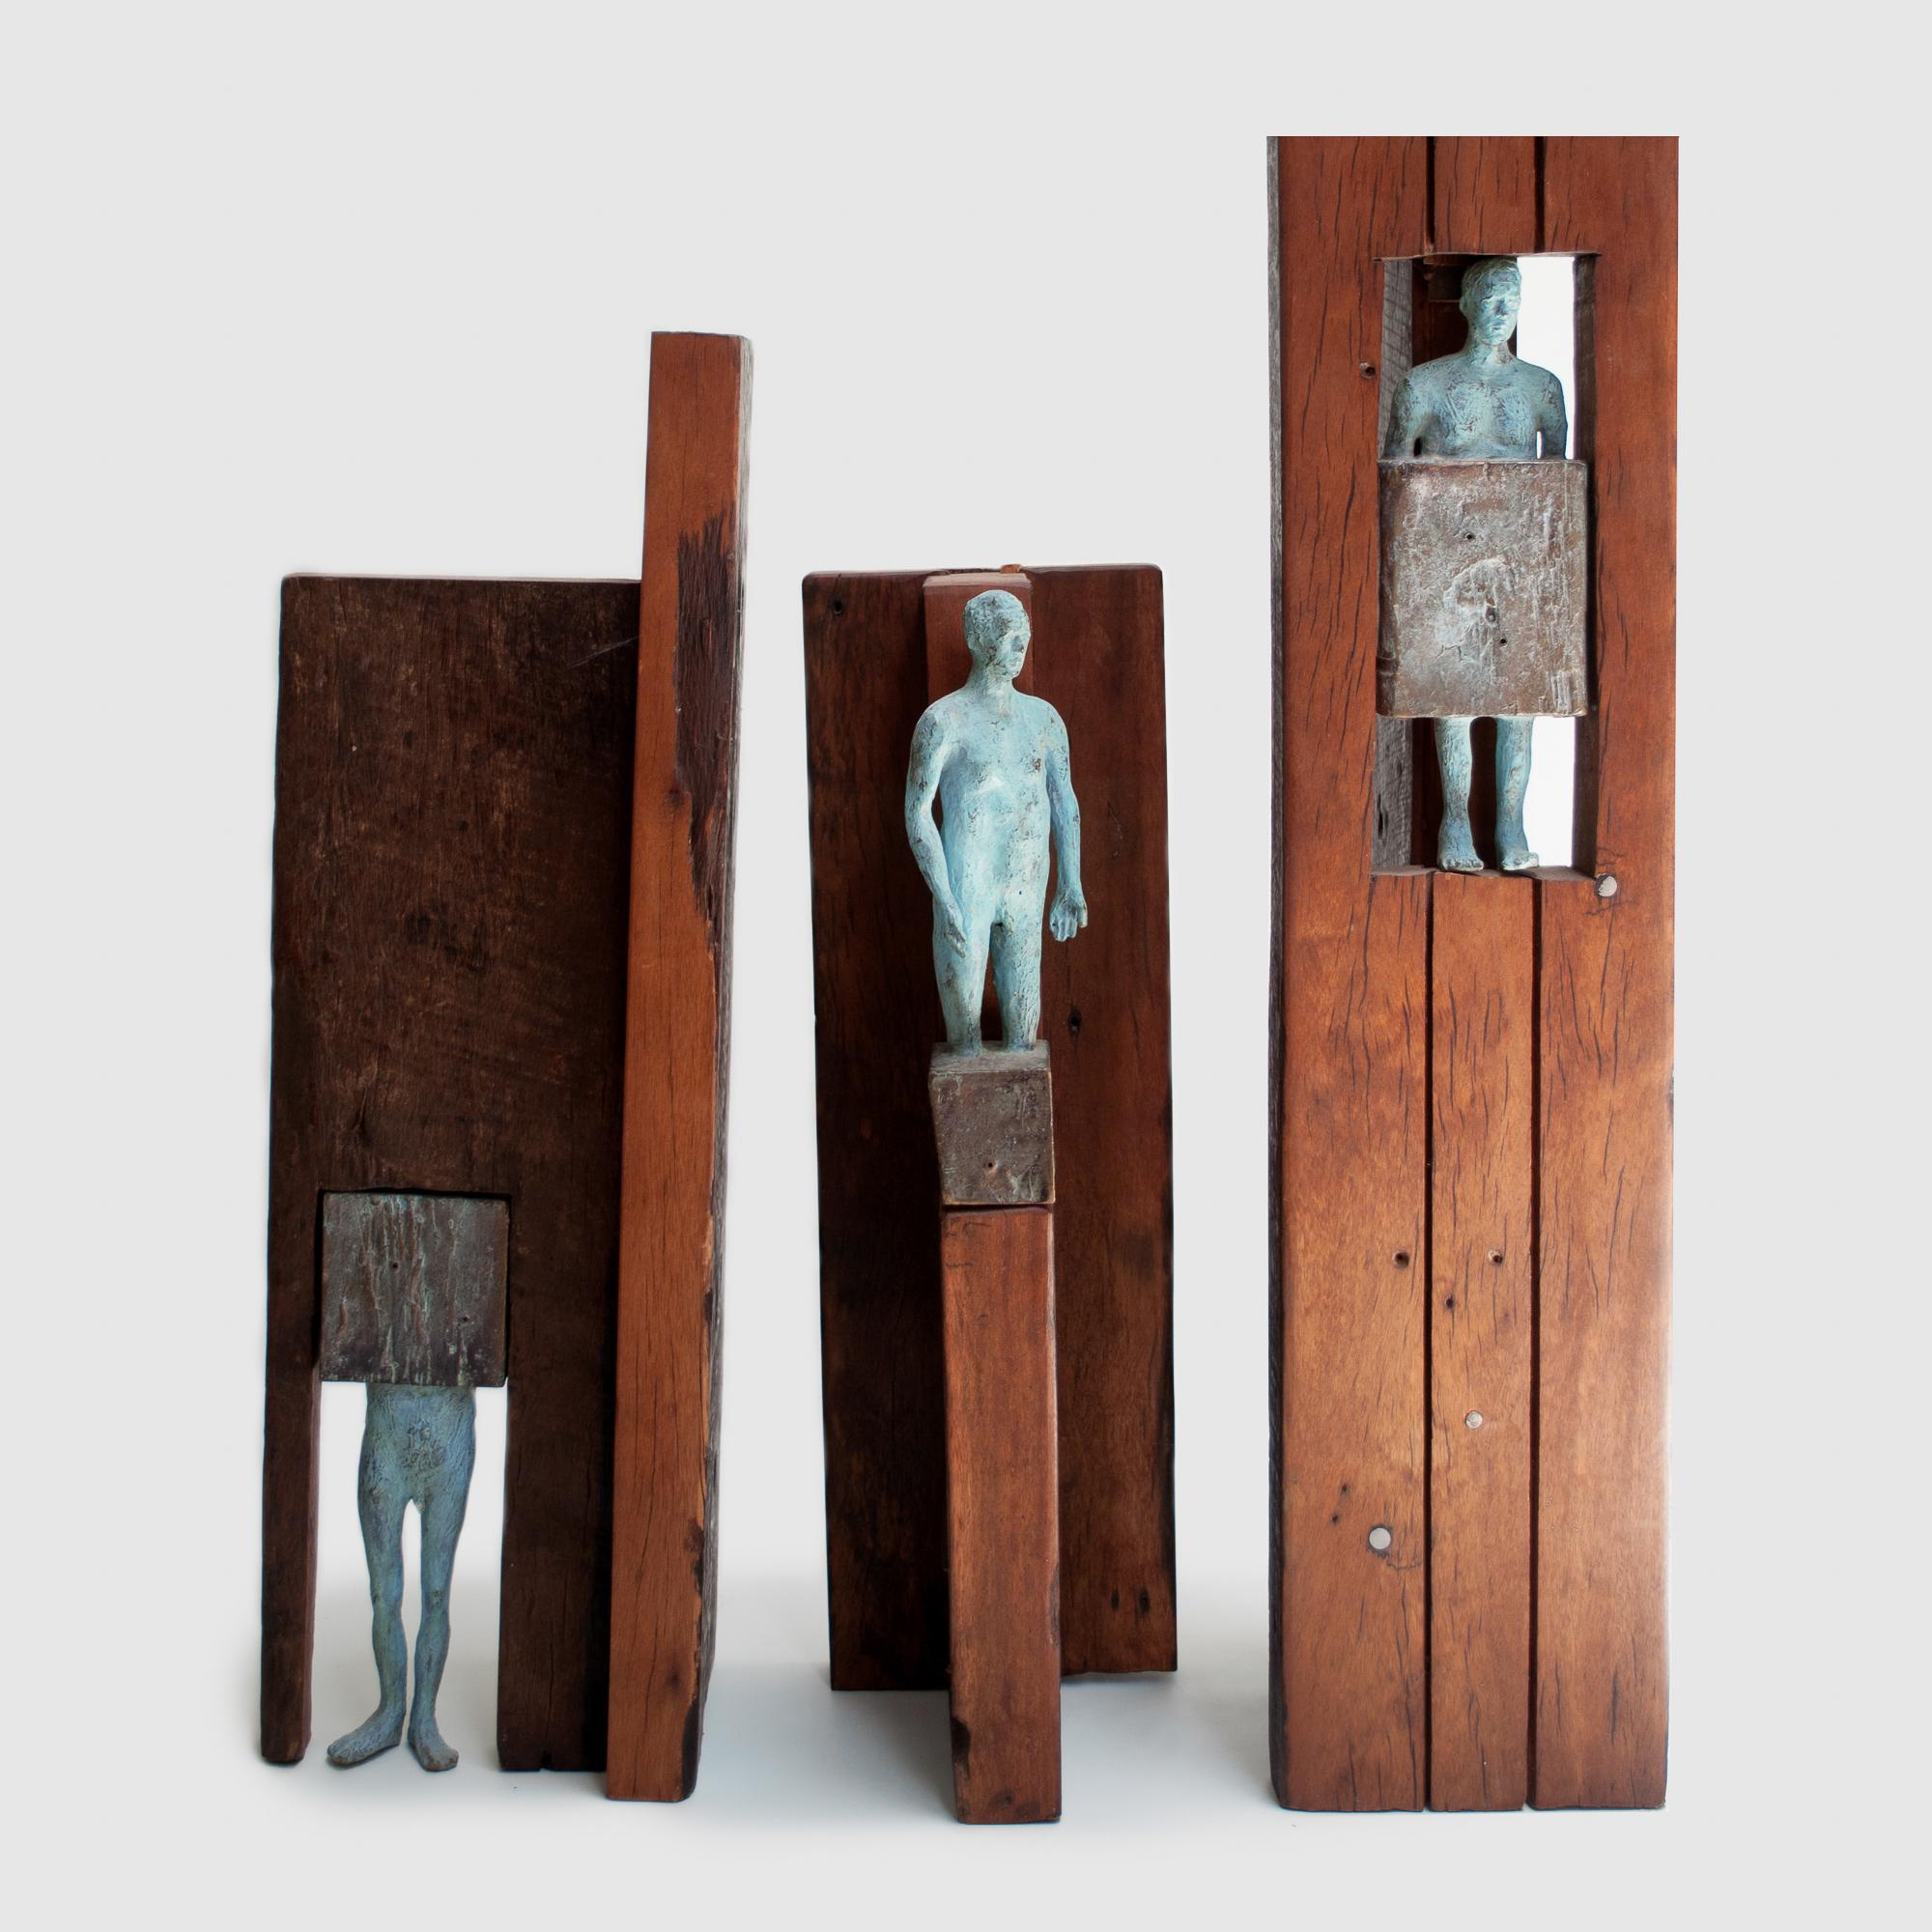 72. Ensamble madera segmentos cuerpo